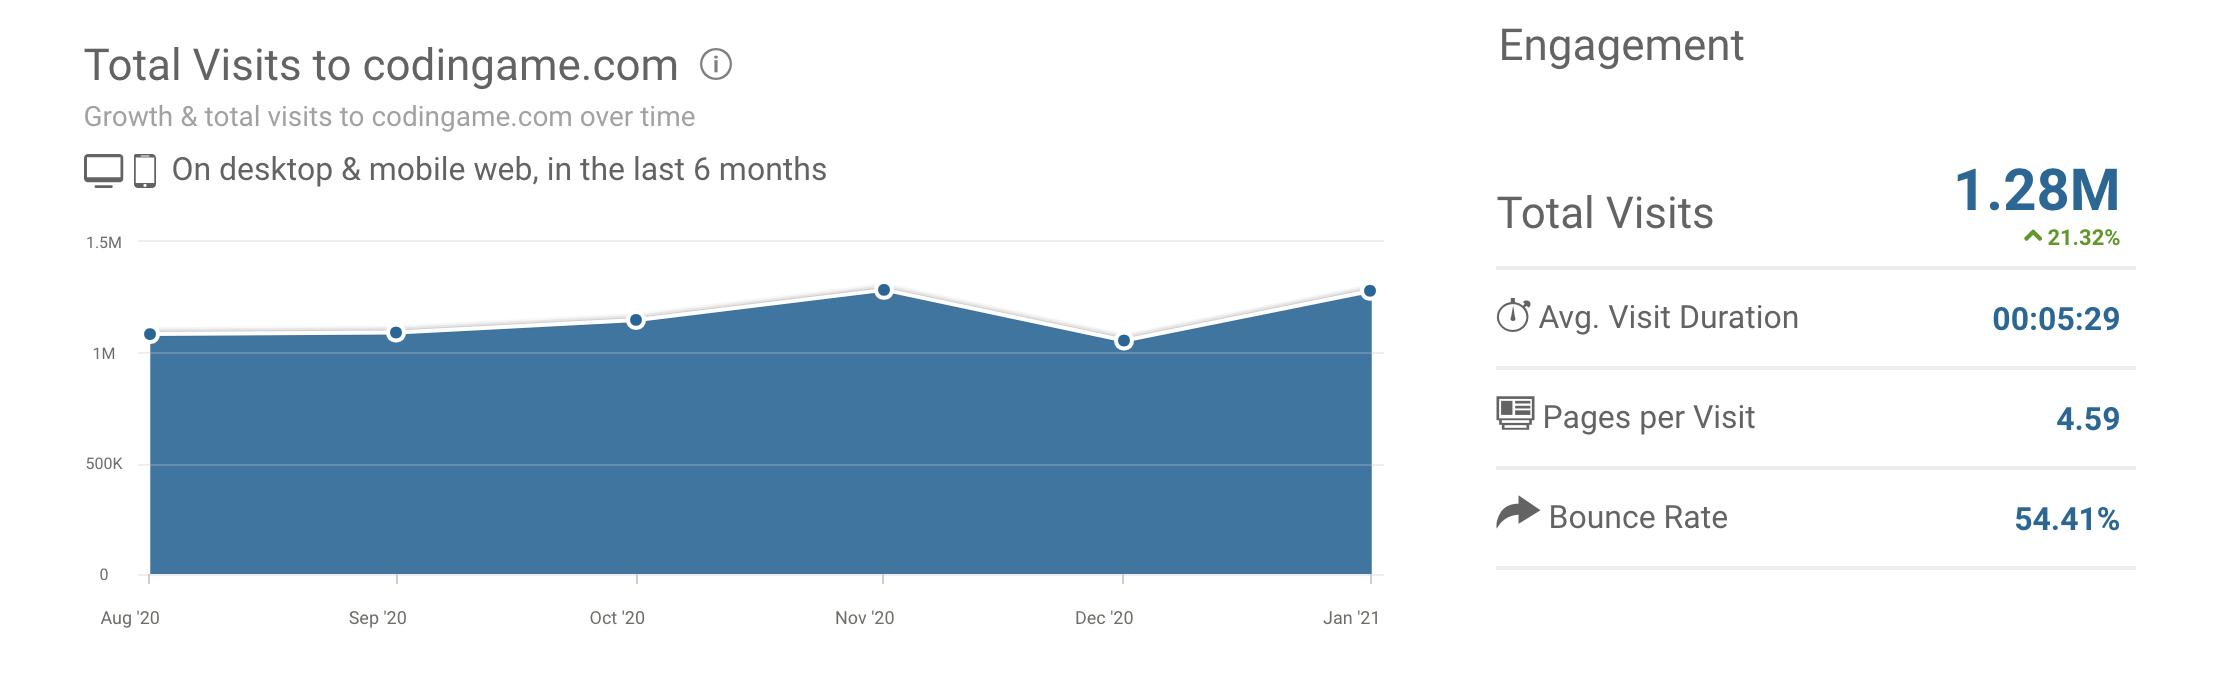 codingame website traffic data